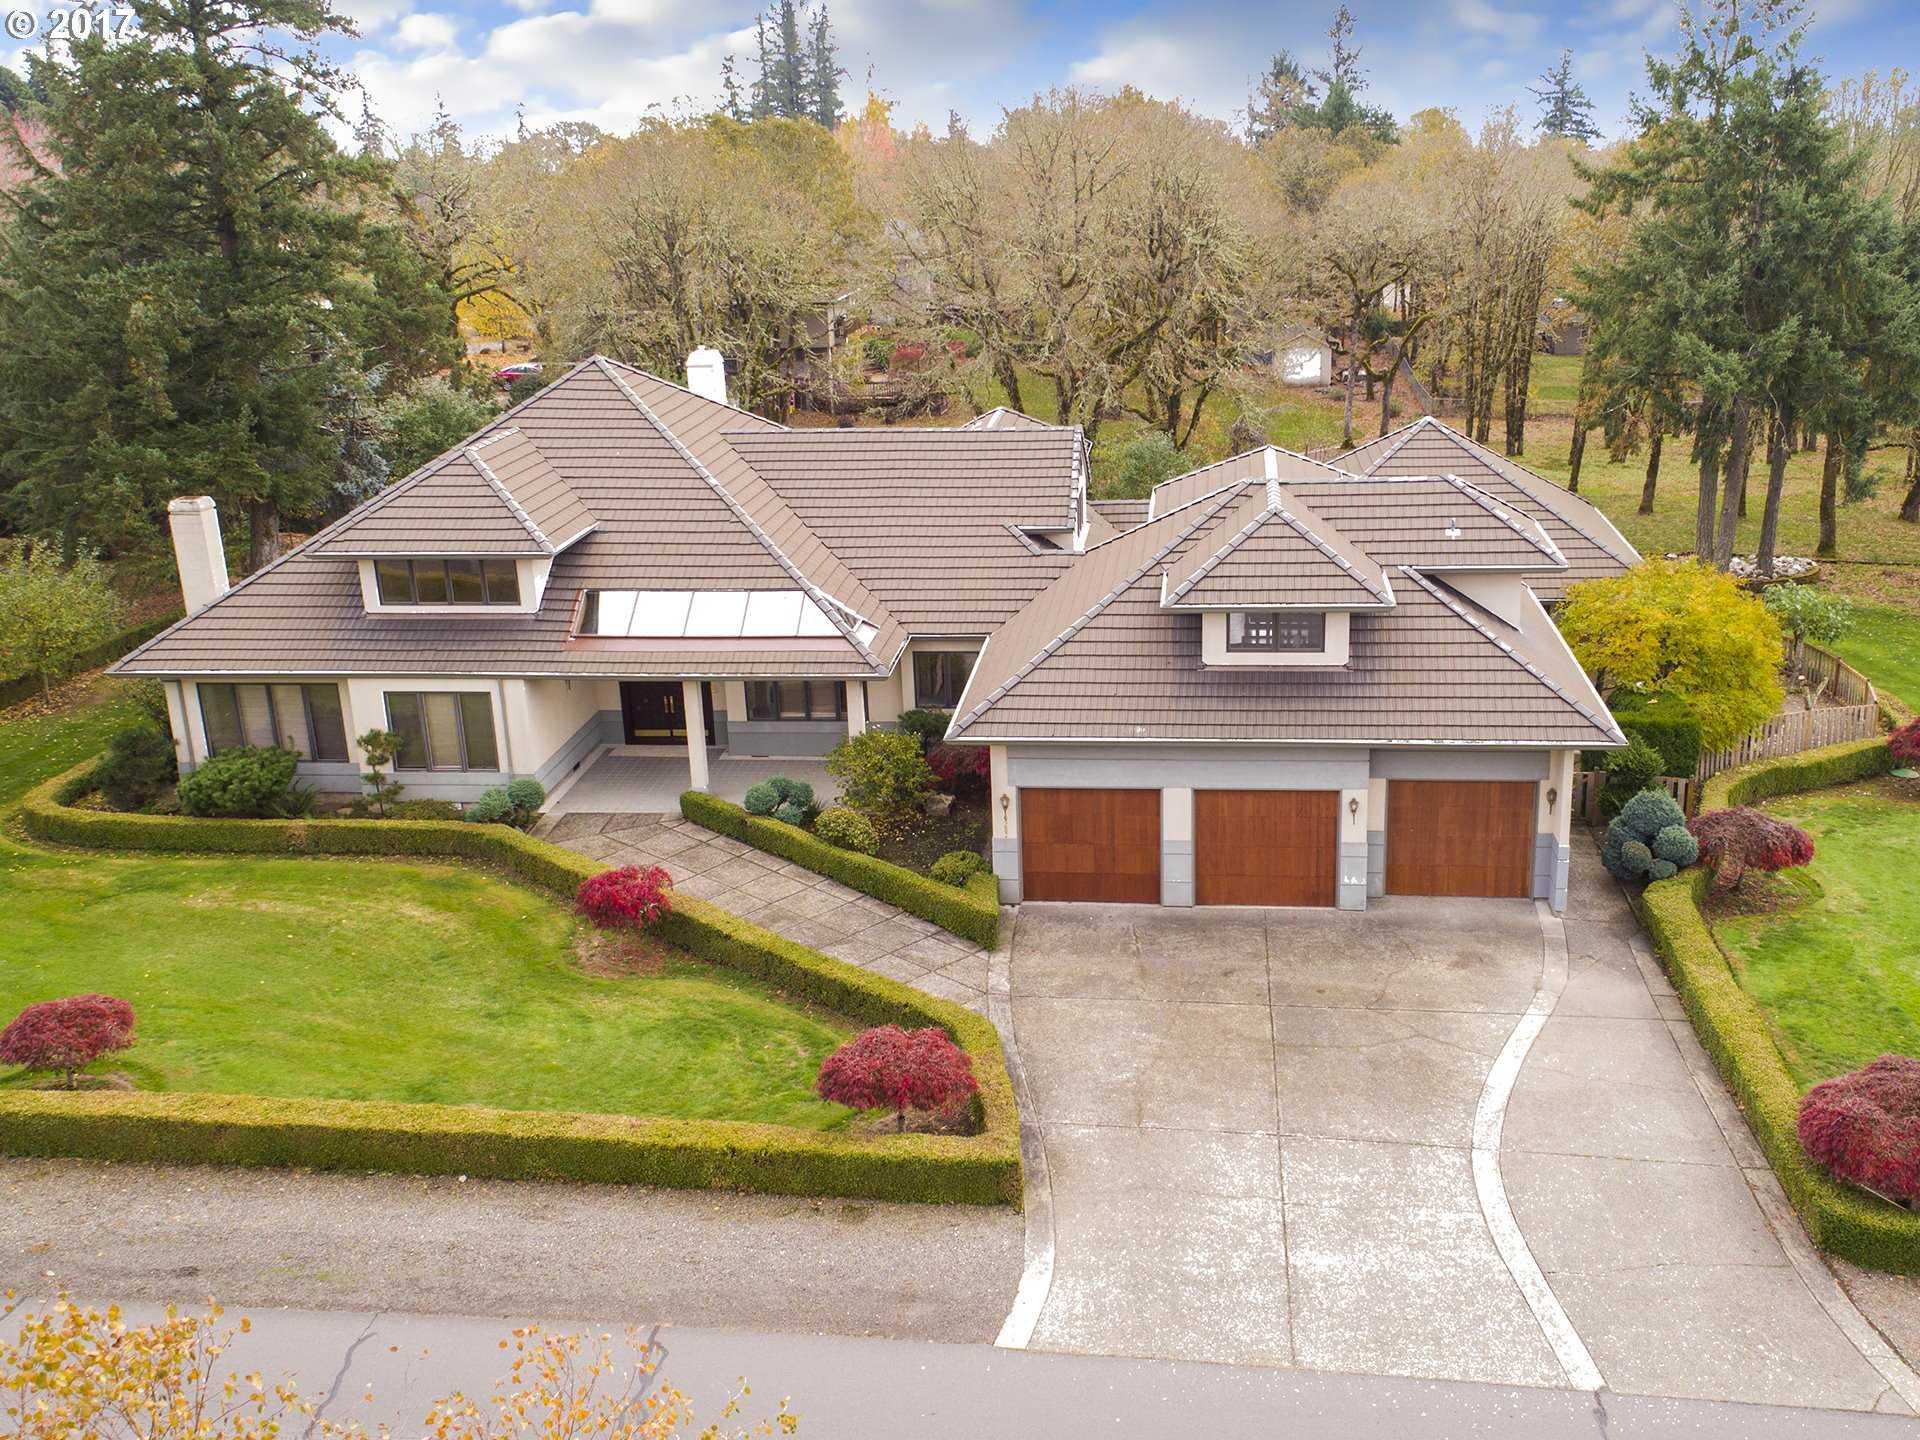 $899,900 - 4Br/6Ba -  for Sale in Cooper Mountain, Beaverton